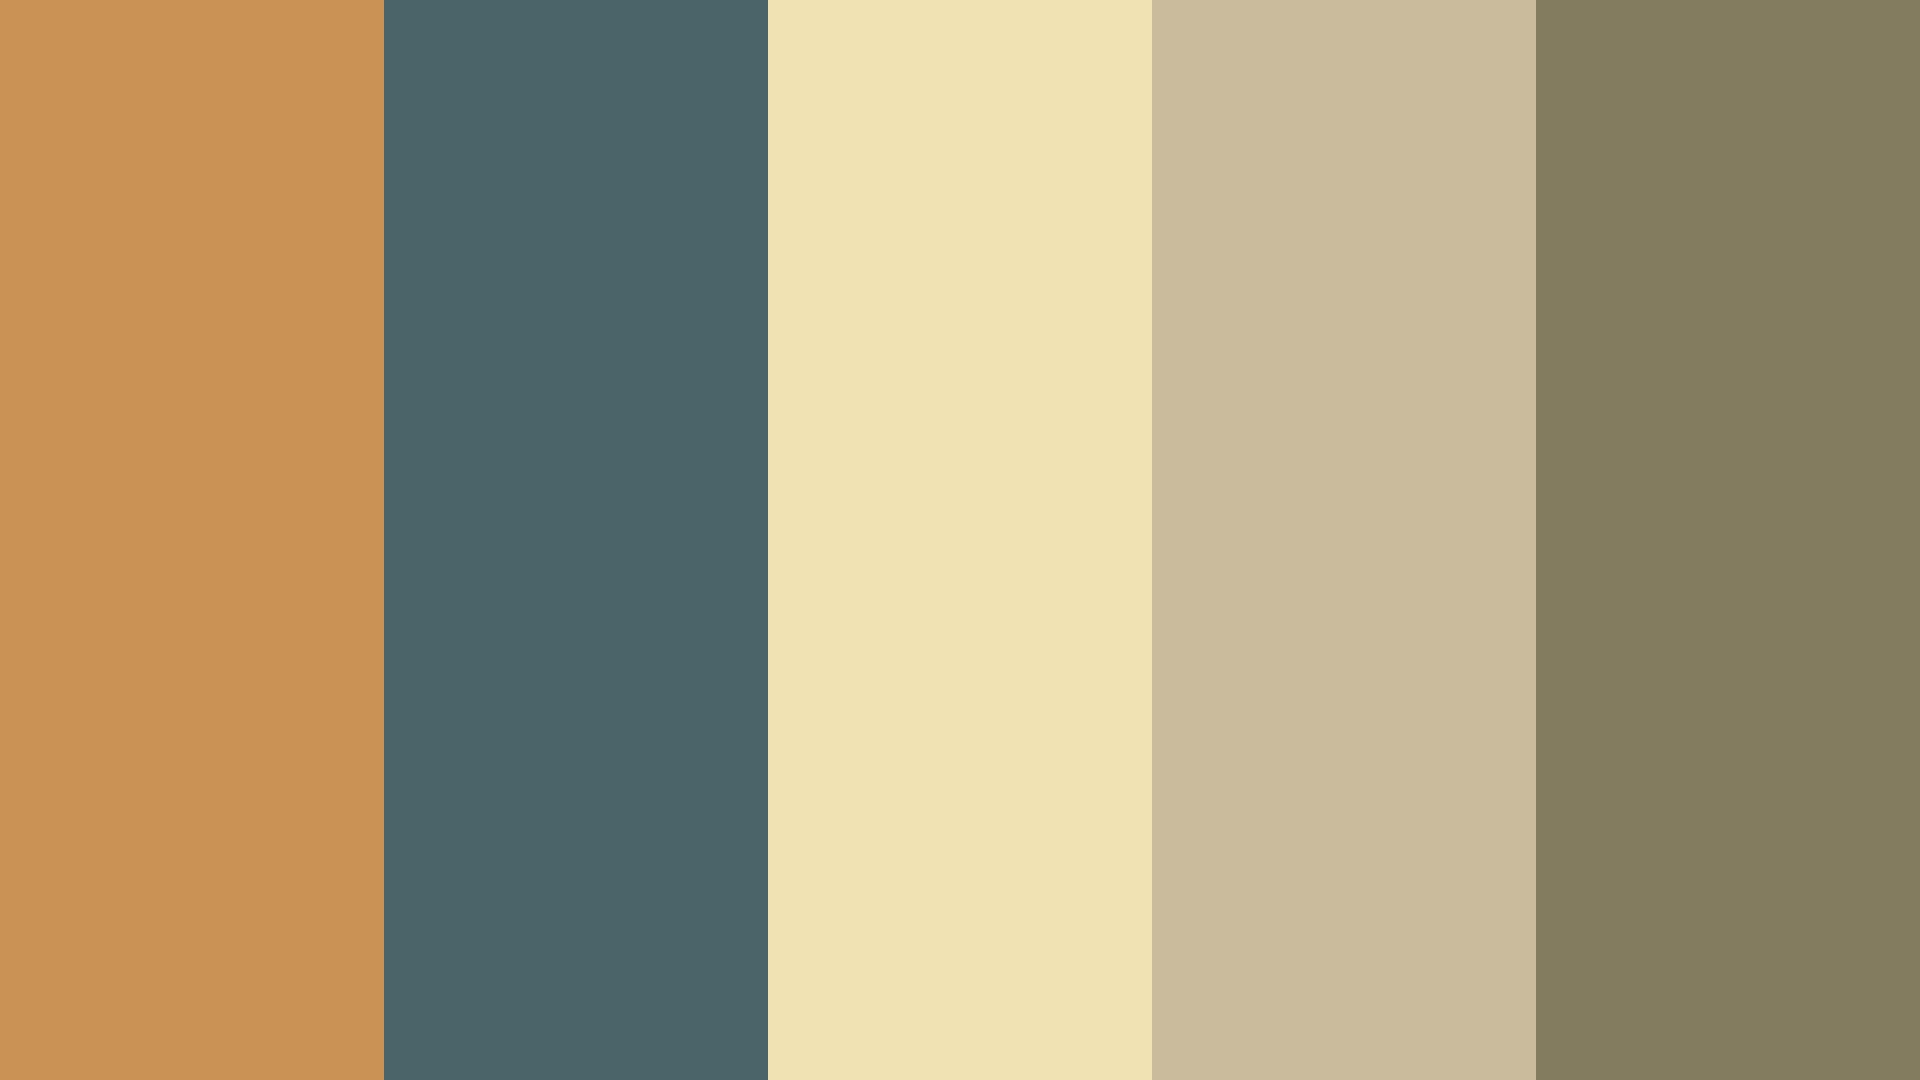 60s Vintage Color Palette Image